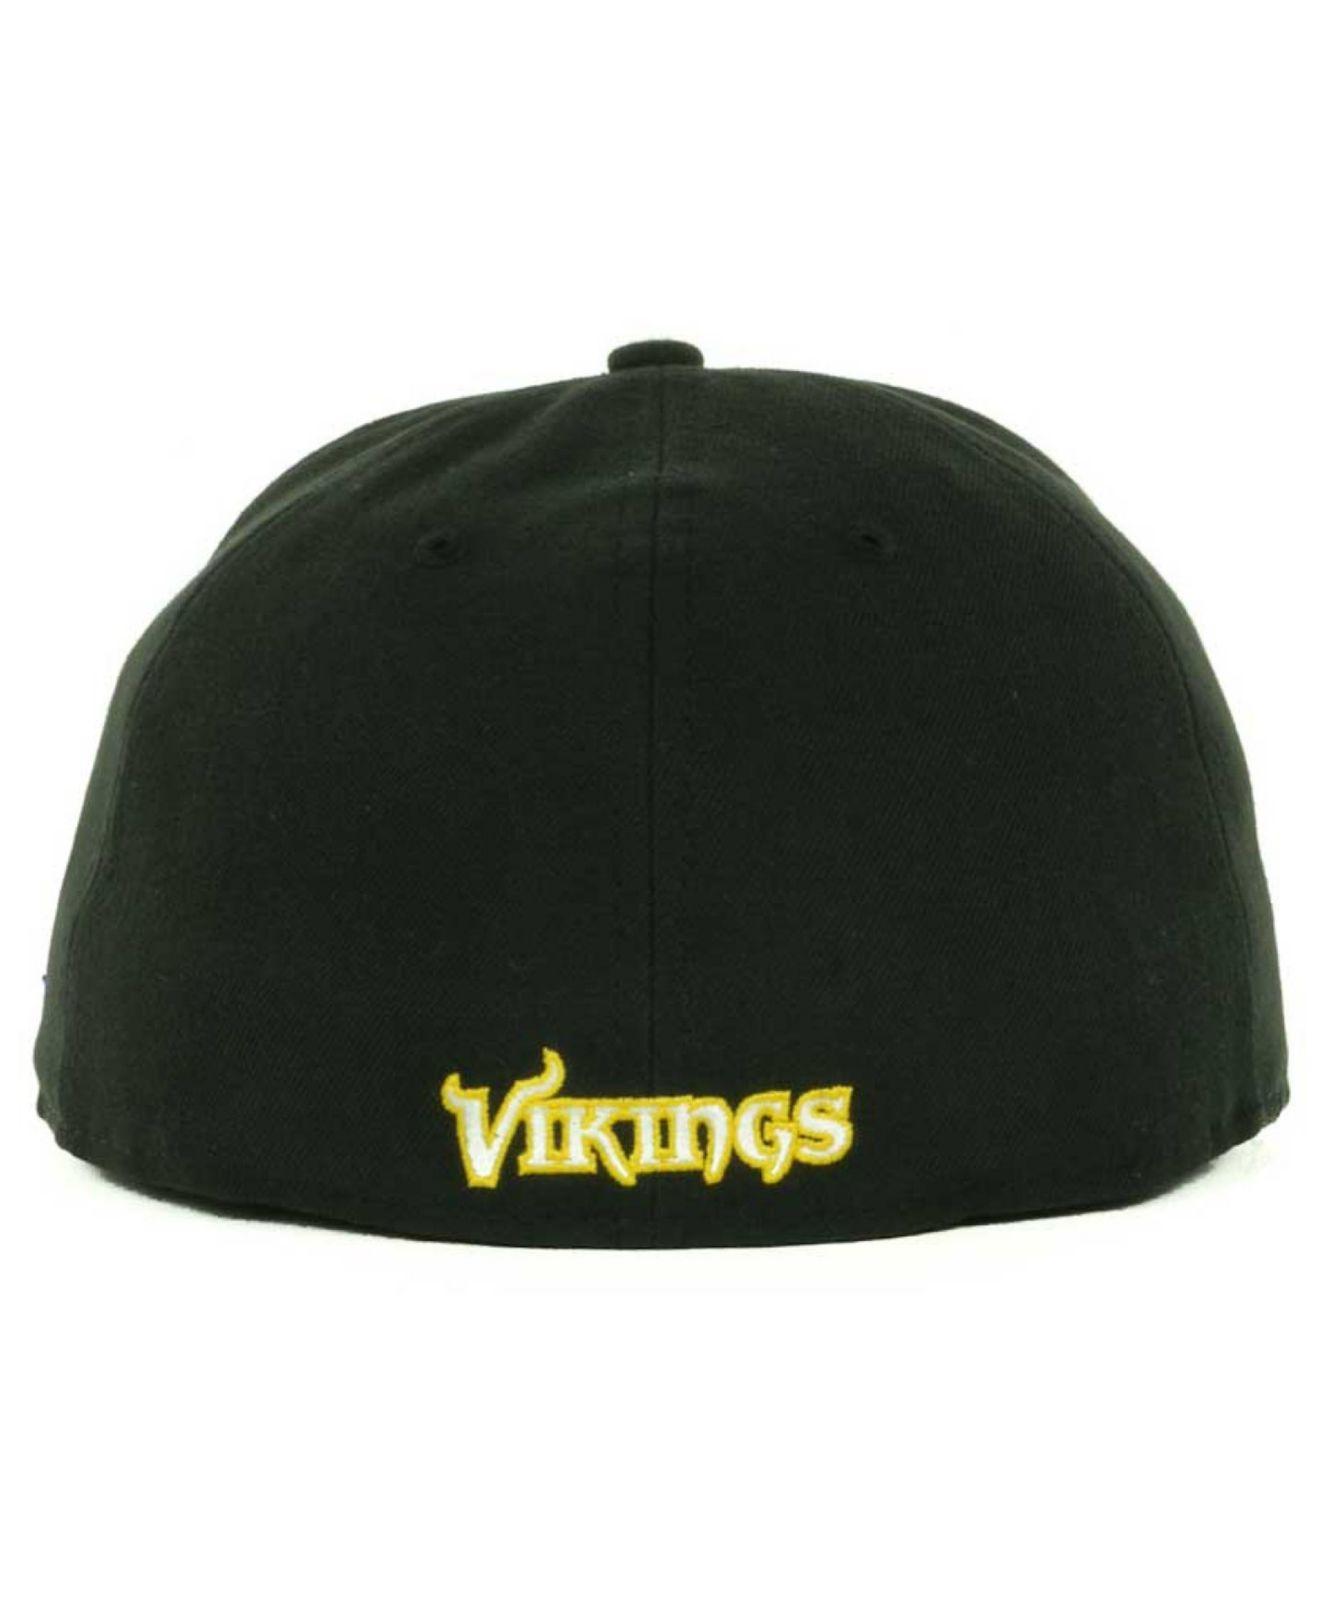 Lyst - Ktz Minnesota Vikings Nfl Black Team 59fifty Cap in Black for Men ceec0a71626